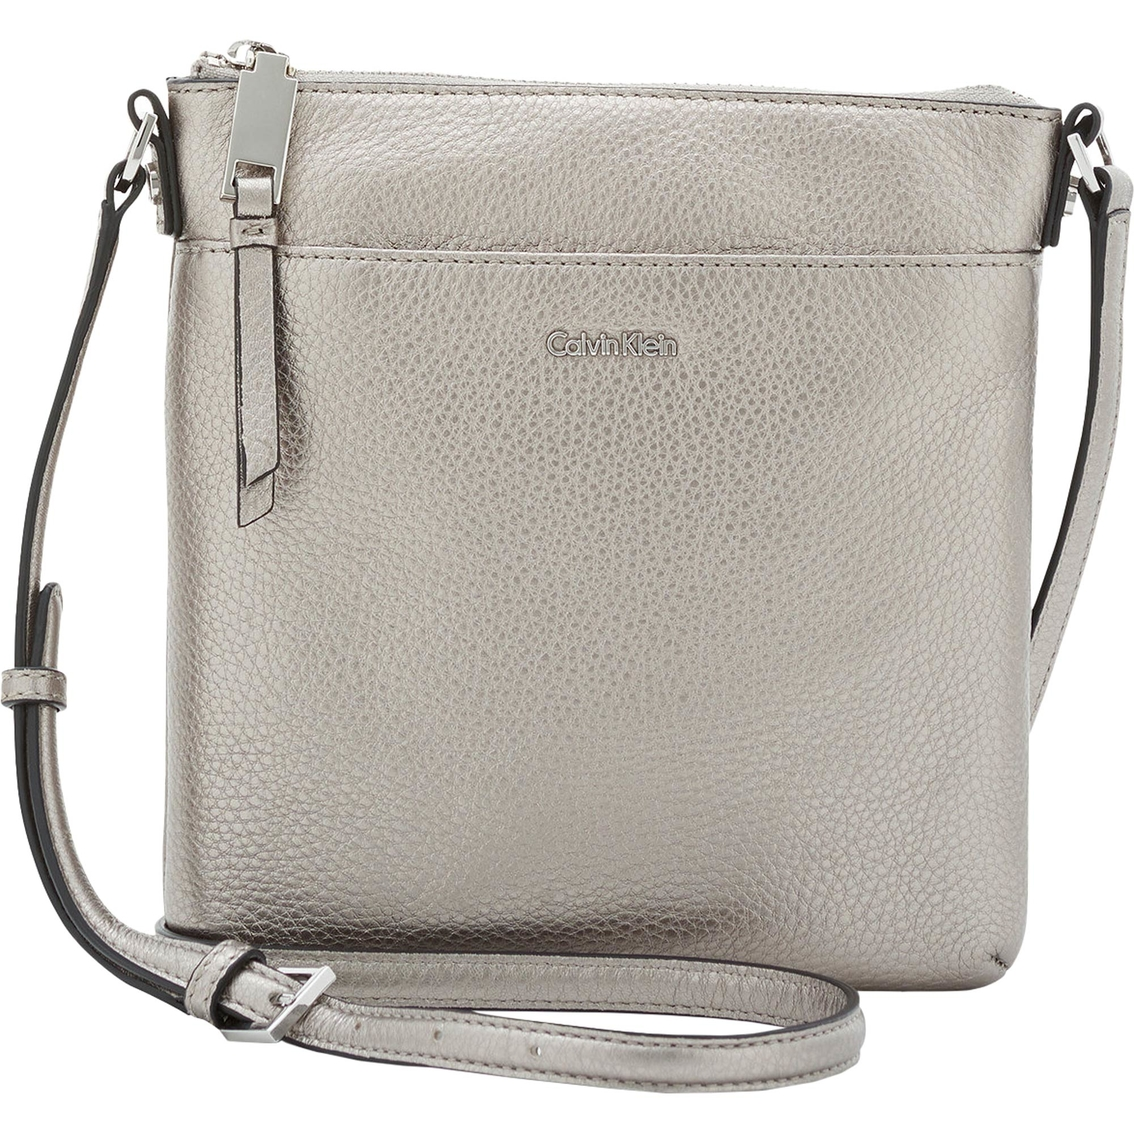 194821b7443 Calvin Klein Pebble Leather Crossbody | Crossbody Bags | Handbags ...